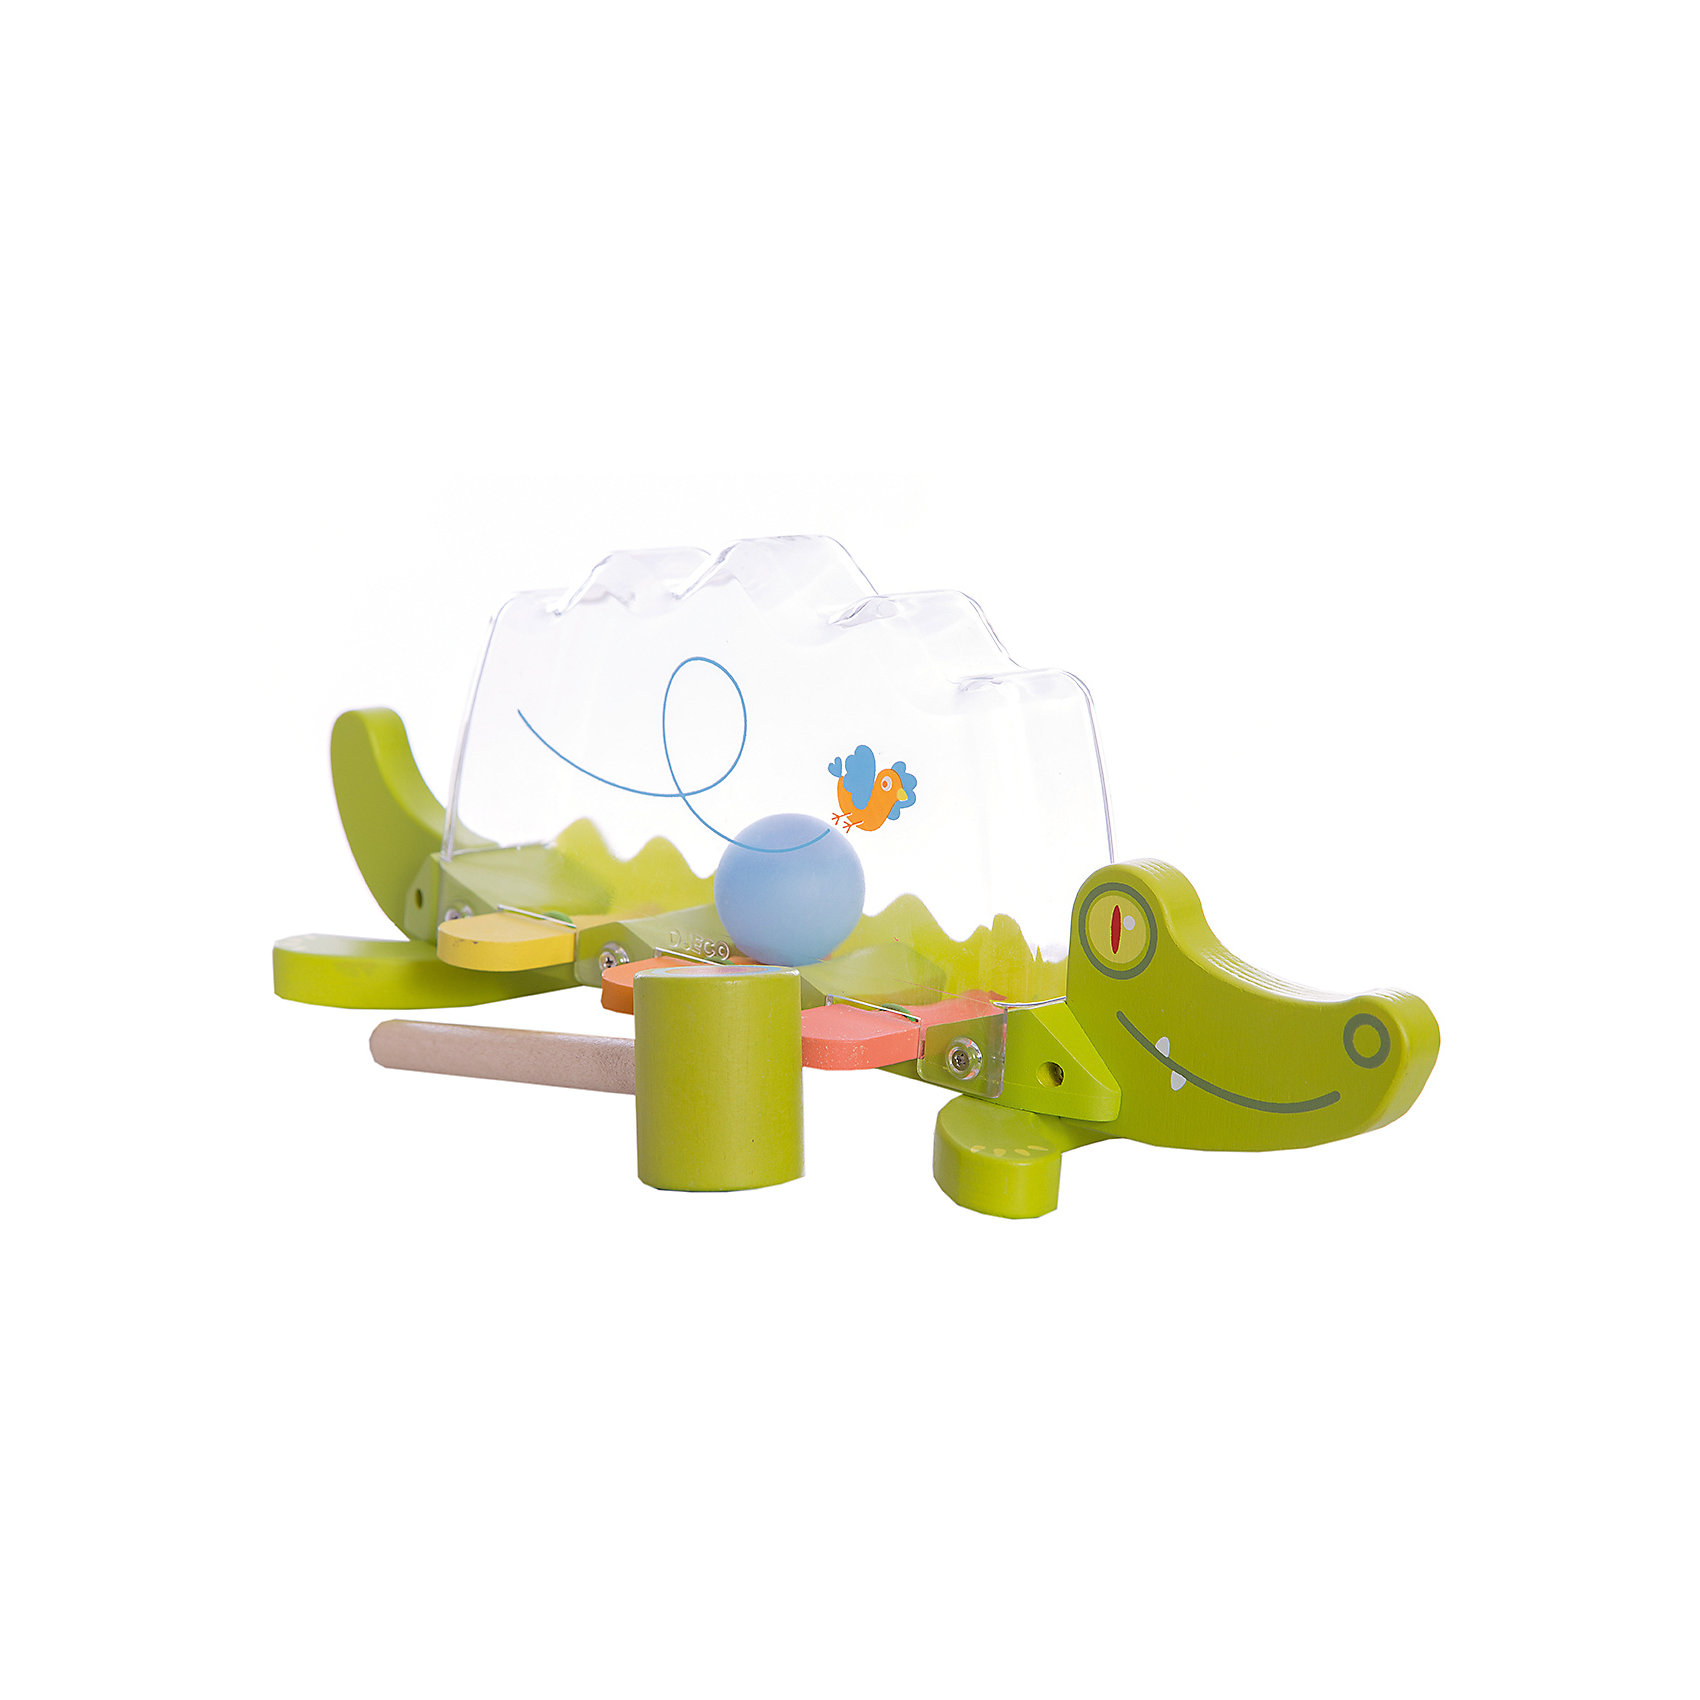 DJECO Развивающая игрушка Крокодил, DJECO развивающая игрушка djeco зверюшки попрыгунчики пастель 06105